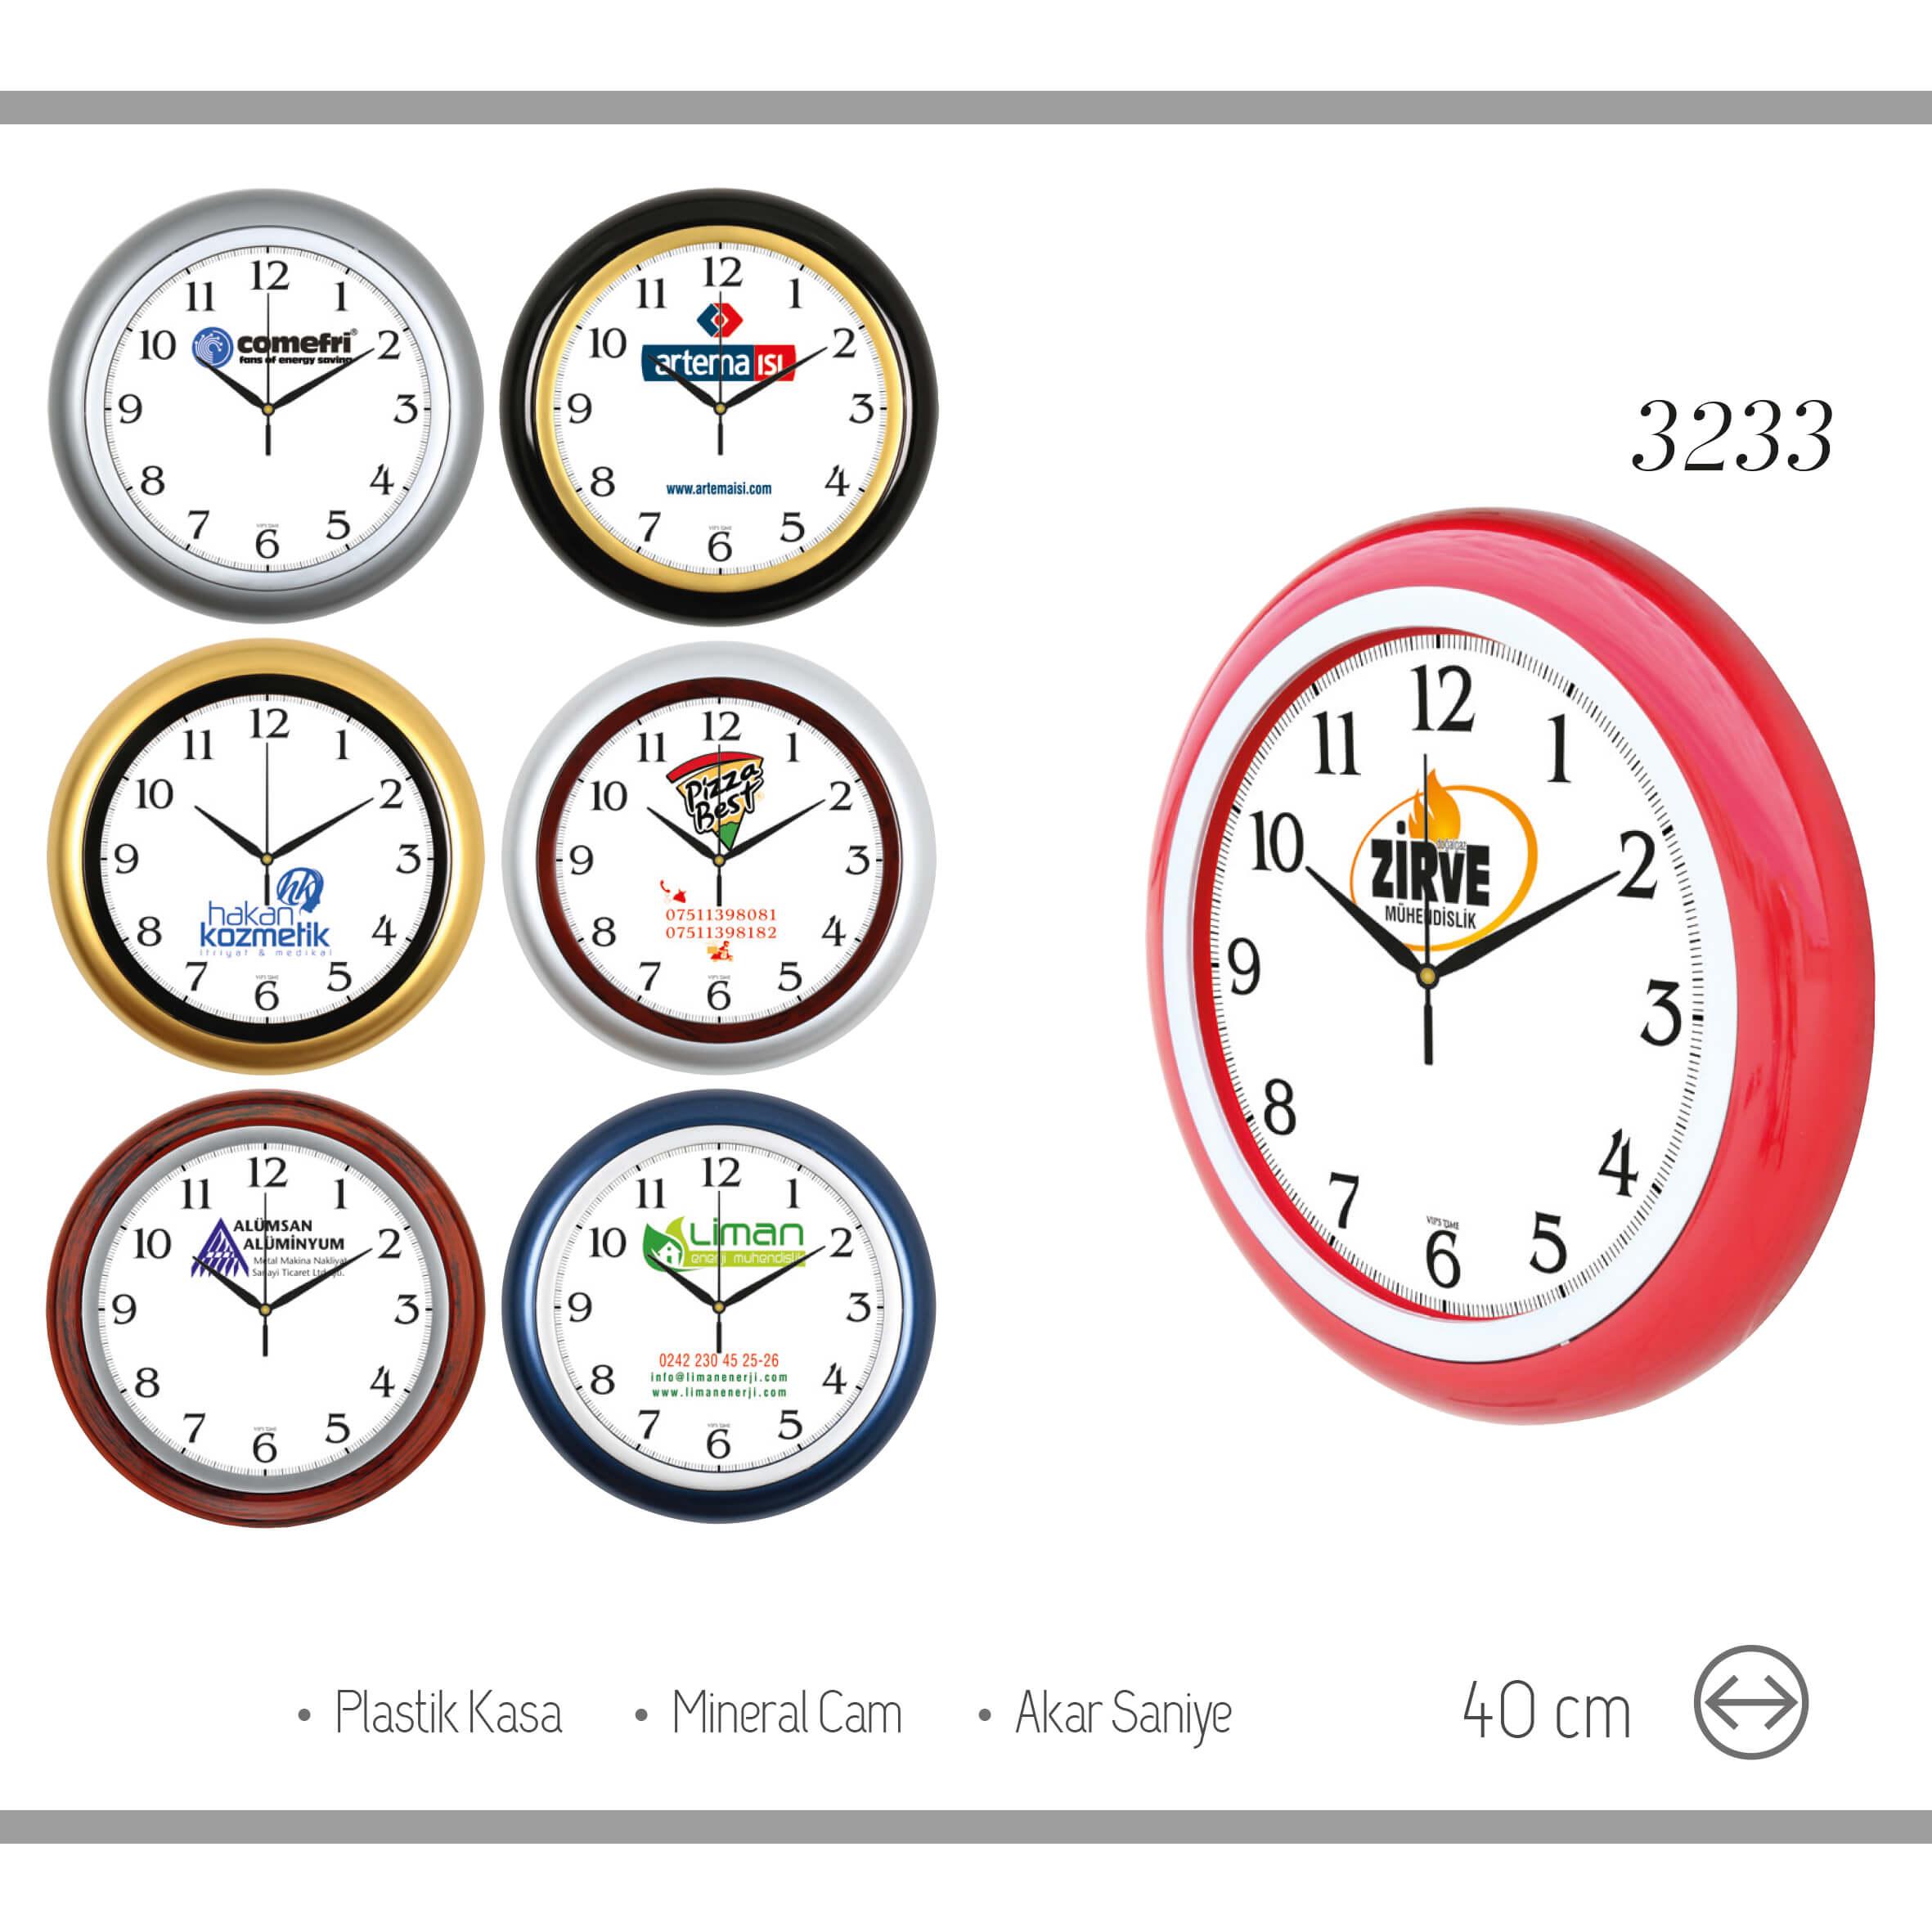 promosyon-promosyon ürünleri-promosyon saatler-duvar saatleri-promosyon duvar saati 3233